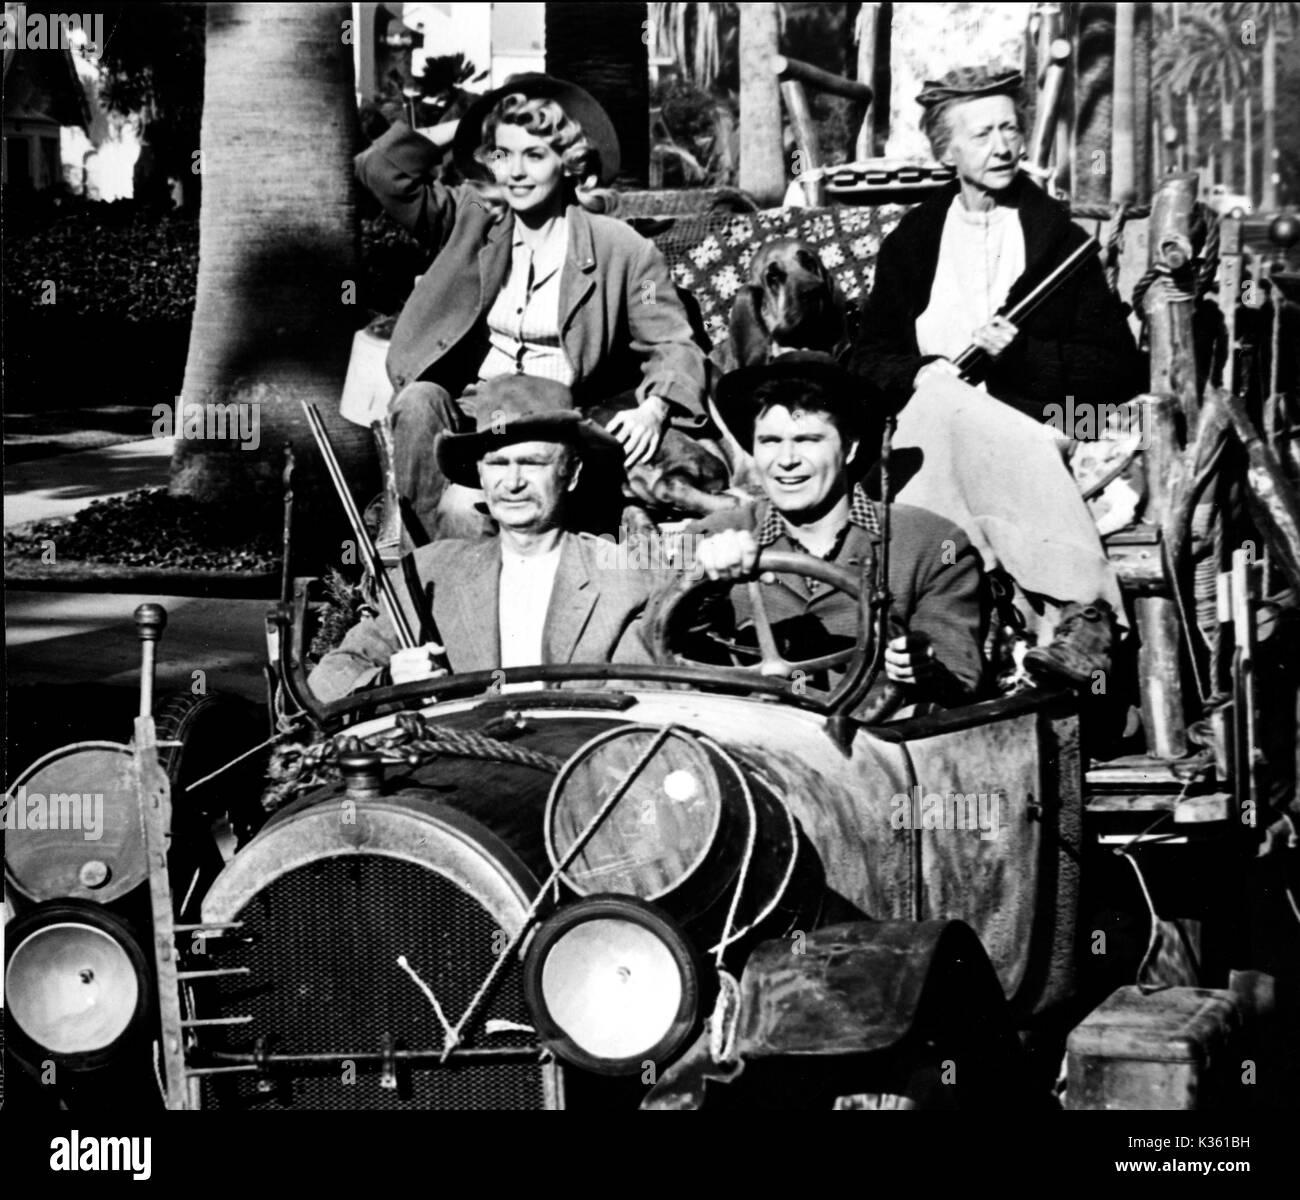 THE BEVERLY HILLBILLIES  DONNA DOUGLAS, BUDDY EBSEN, IRENE RYAN, MAX BAER JR Stock Photo